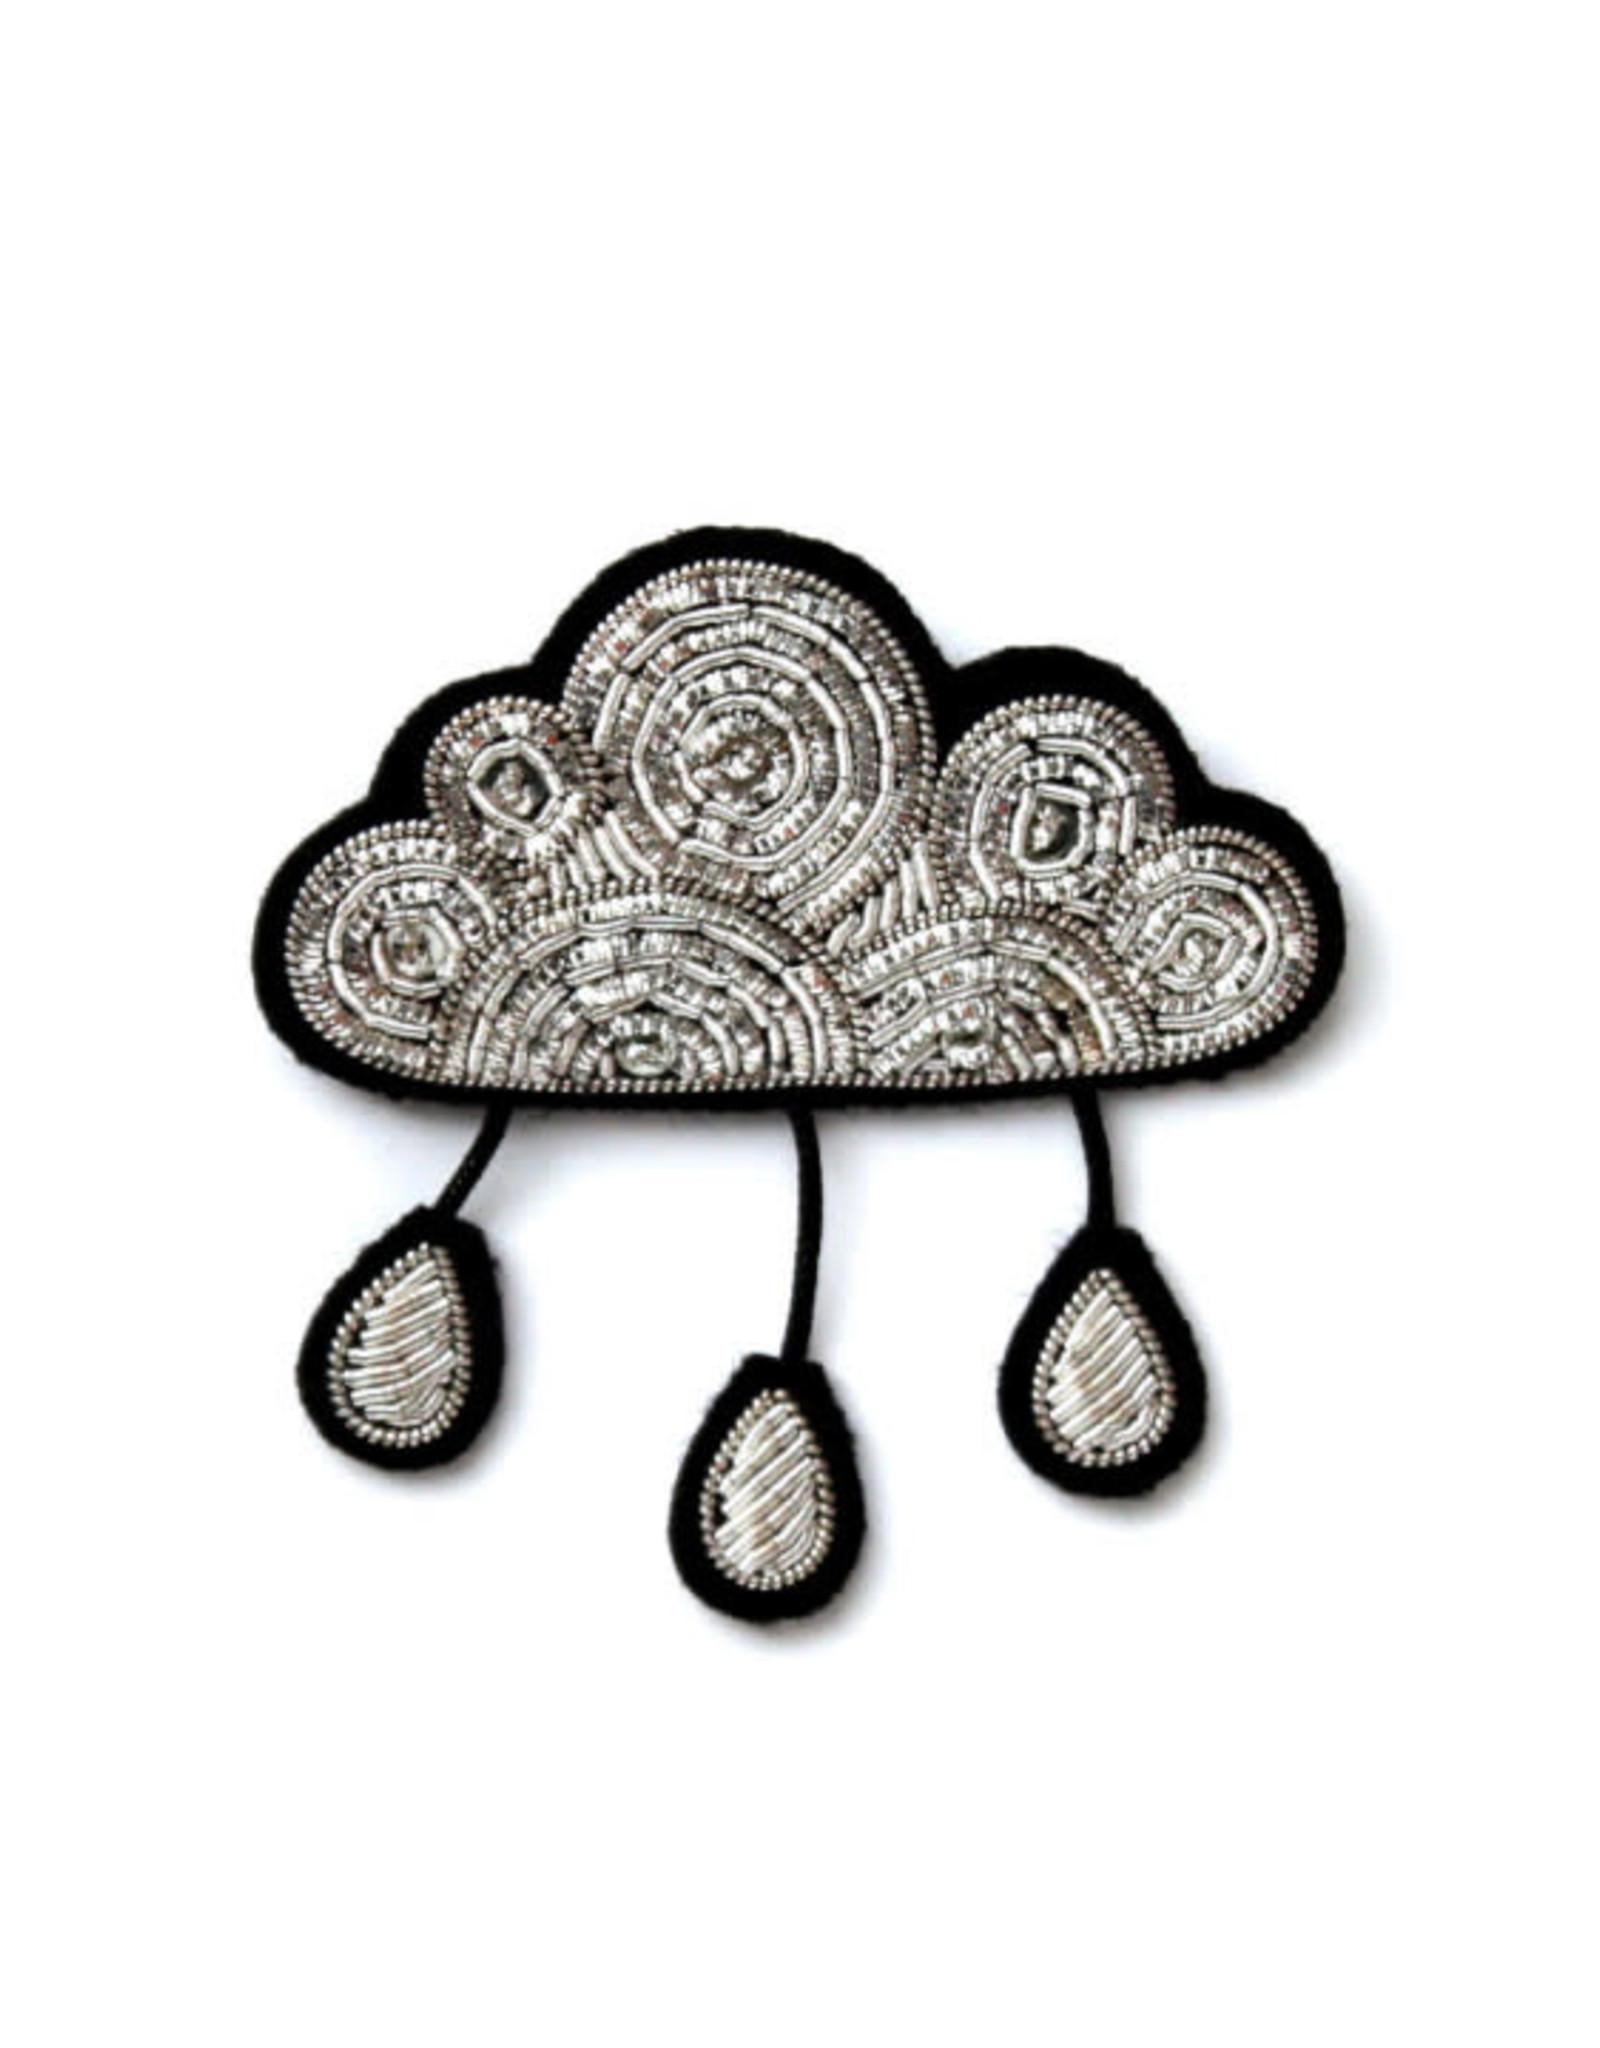 Macon&Lesquoy Brooch - Cloud and rain